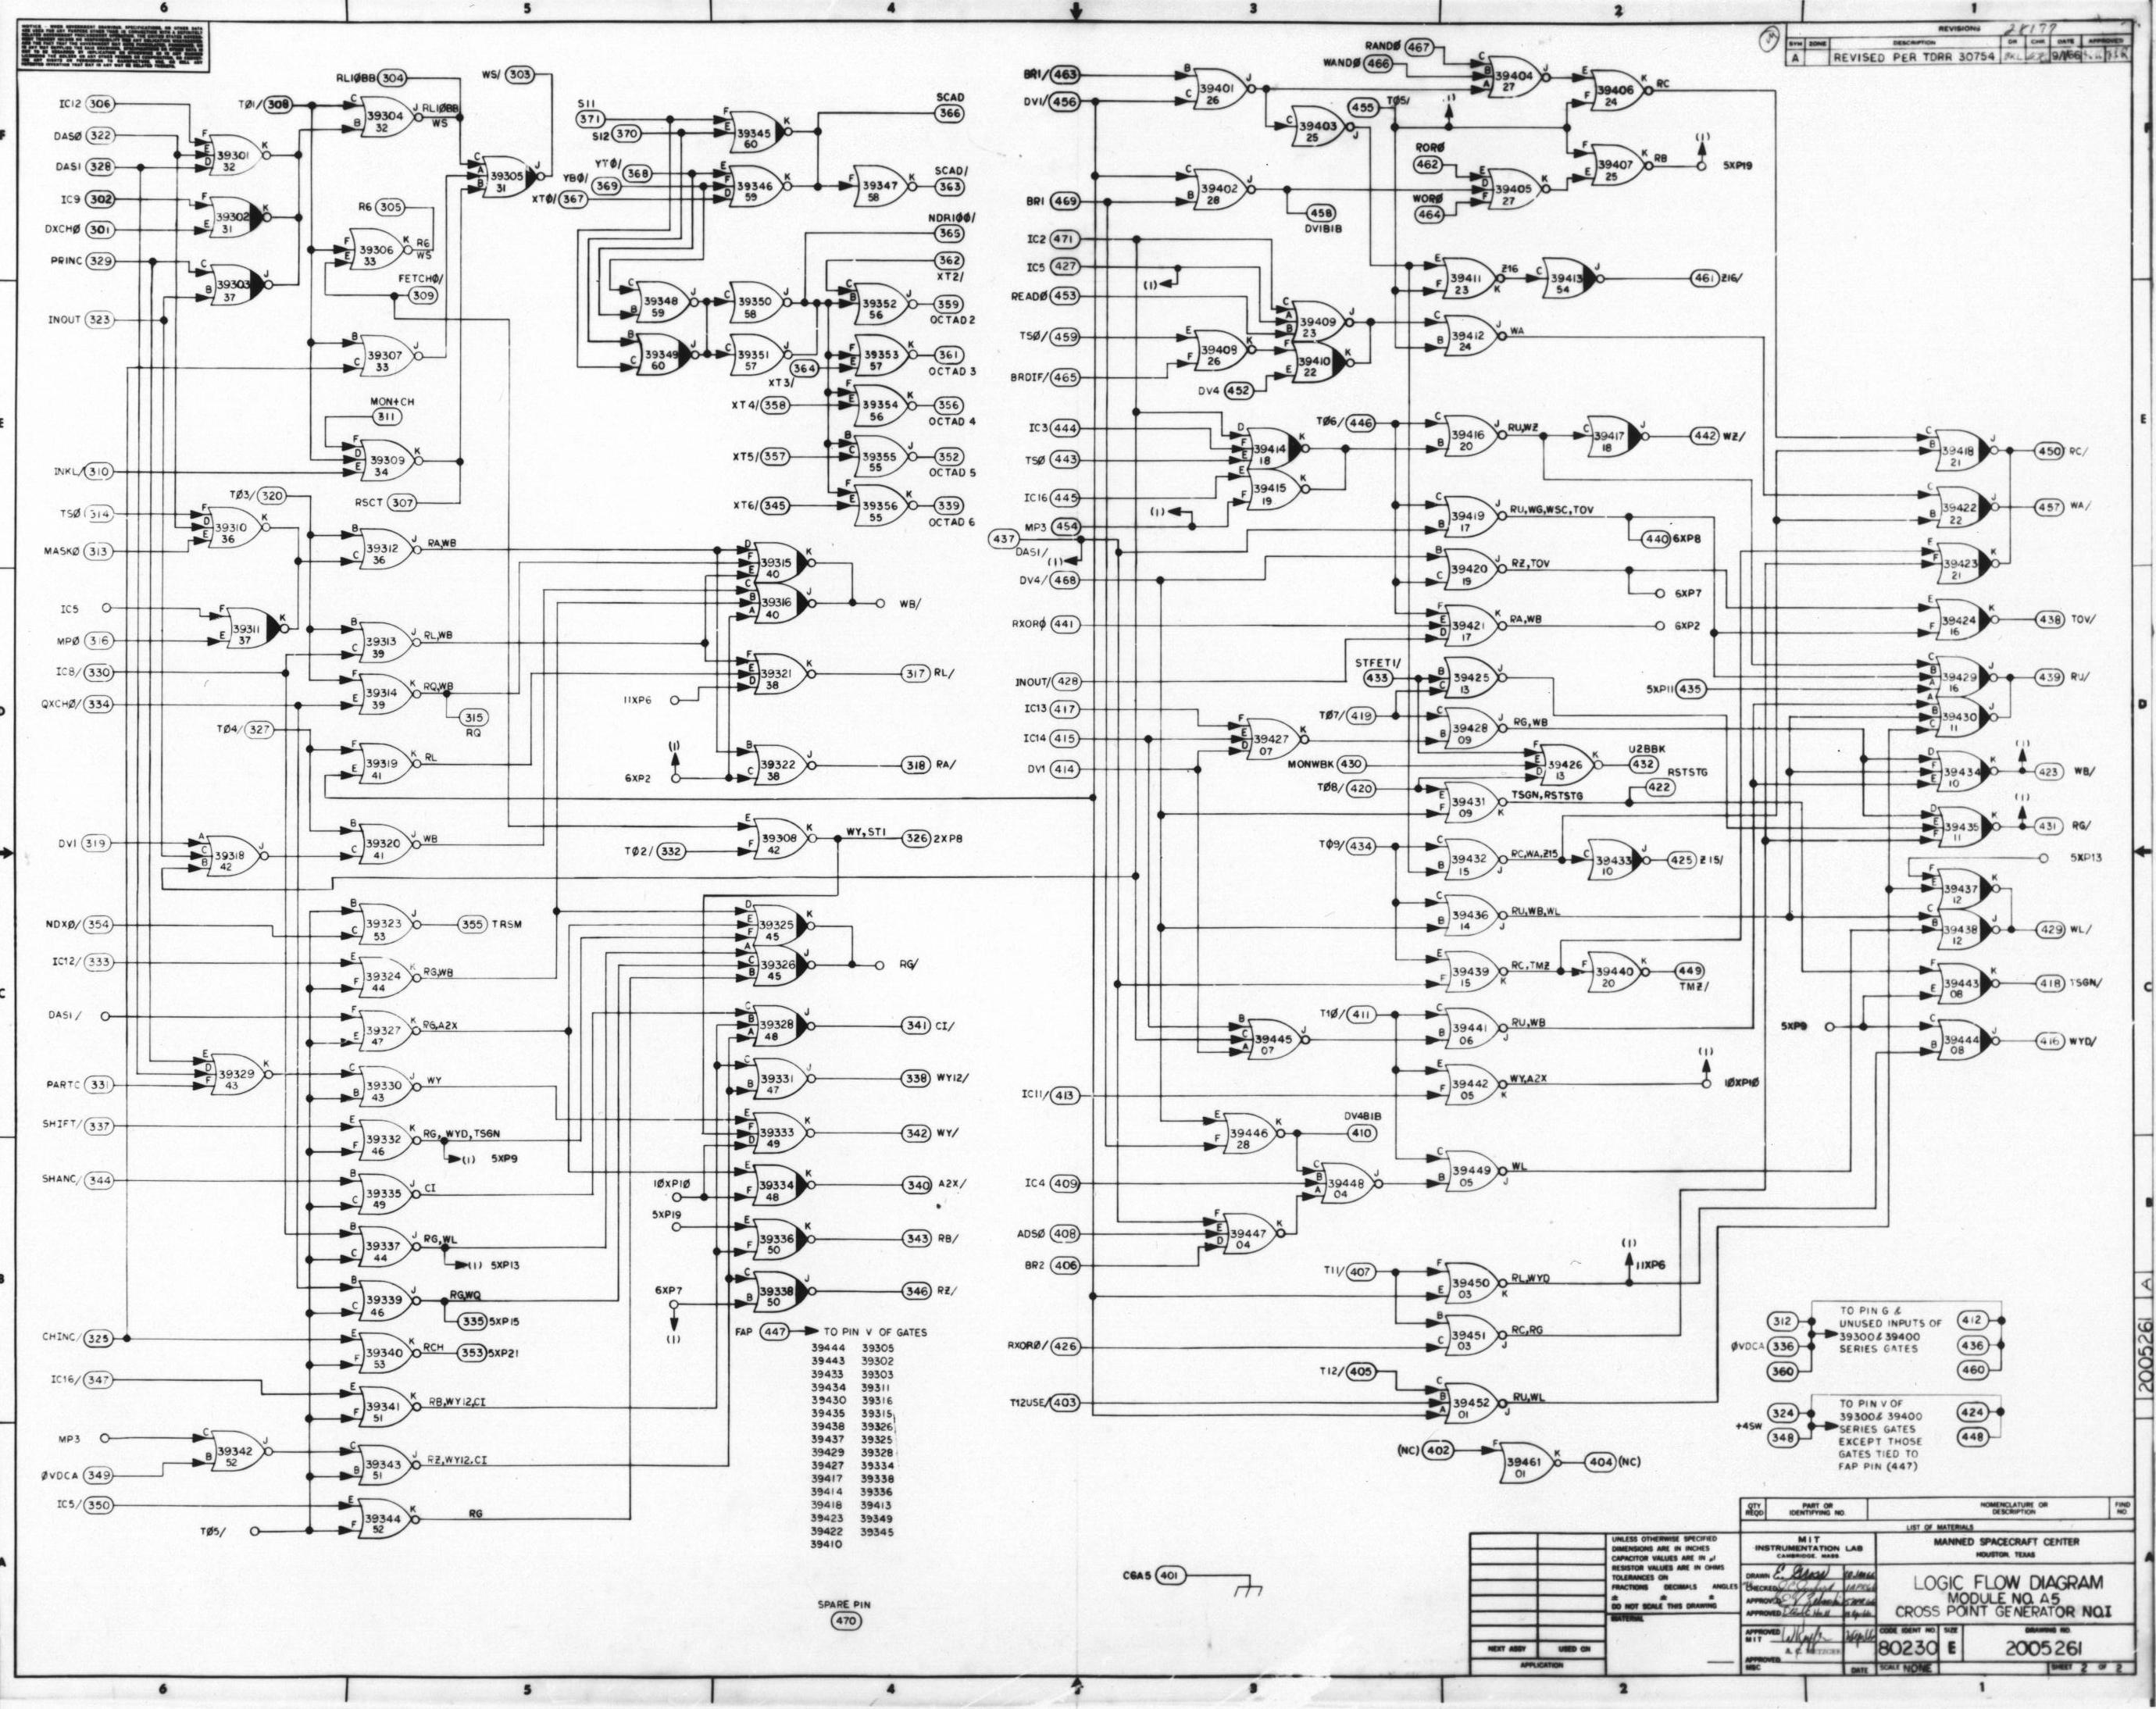 APOLLO GUIDANCE COMPUTER (AGC) Schematics